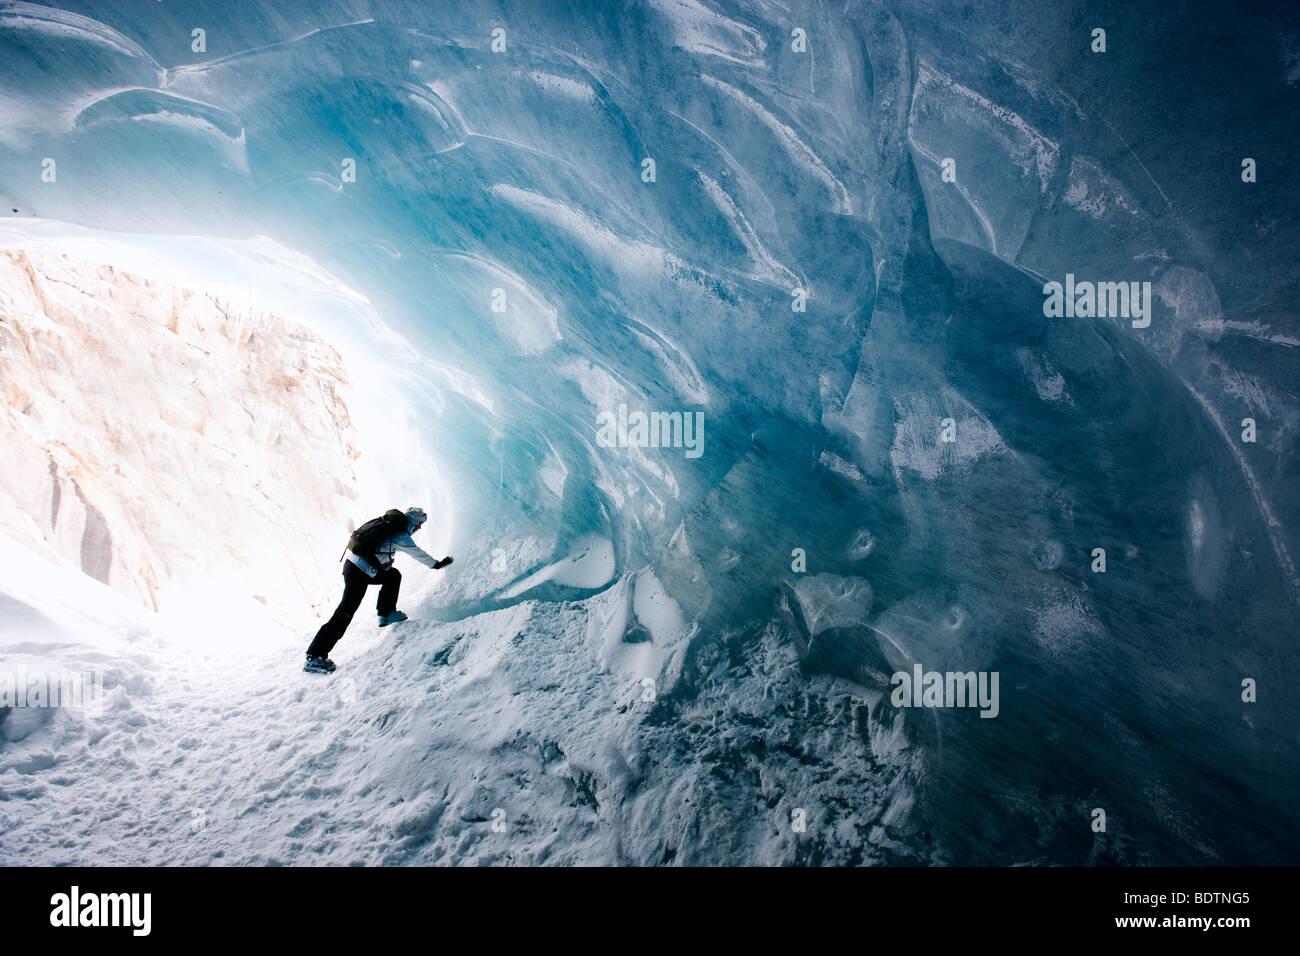 Ice cave Mer de Glace Chamonix France. - Stock Image